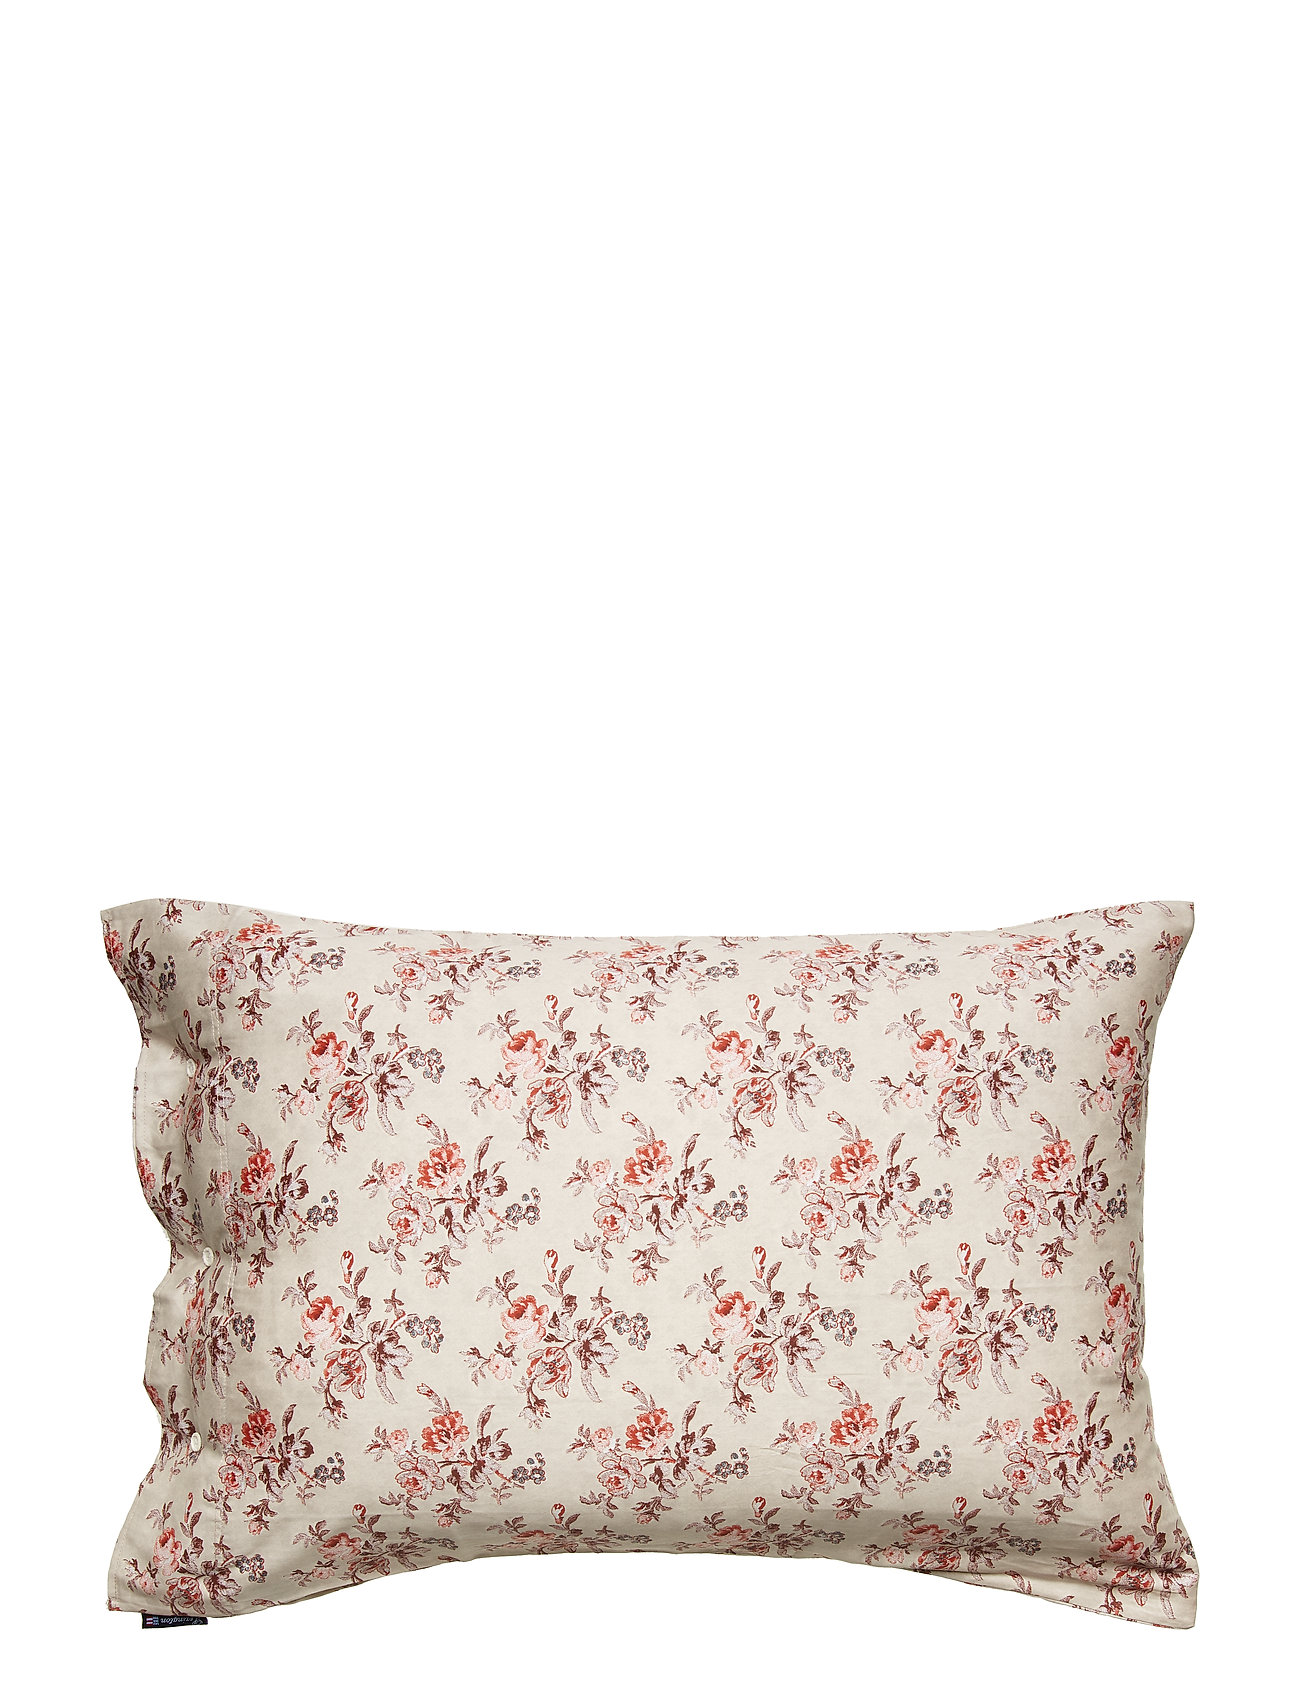 Lexington Home Printed Floral Sateen Pillowcase - AUTUMN FLORAL